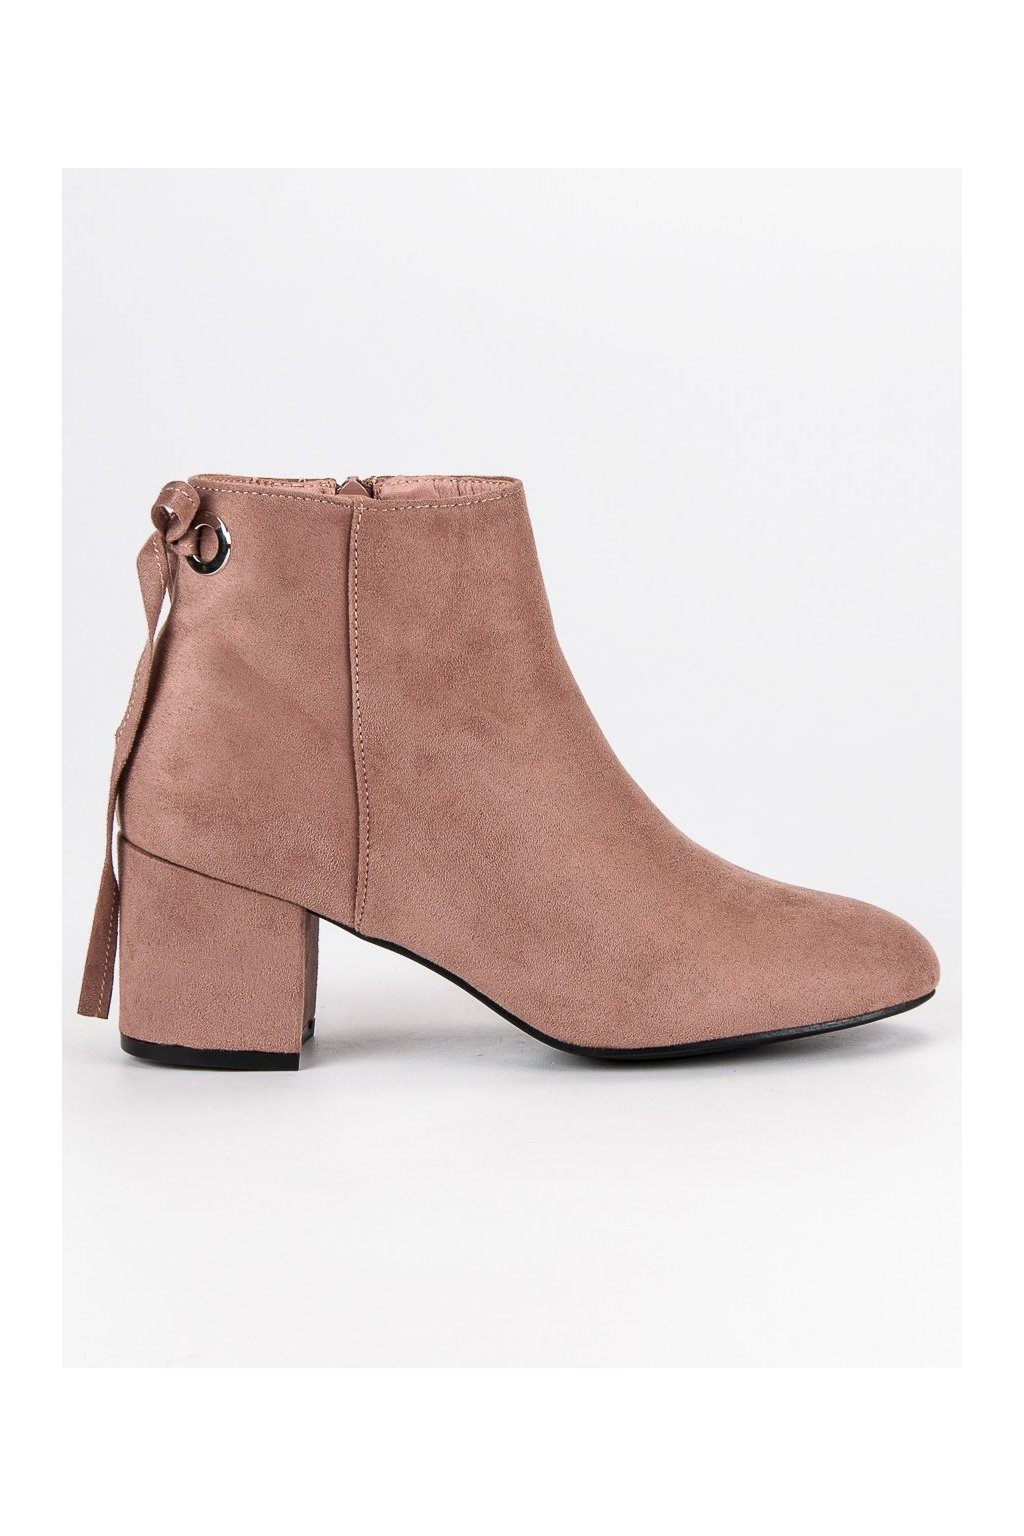 Klasické topánky ružové členkové čižmy semišové CnB 684e5fc8727